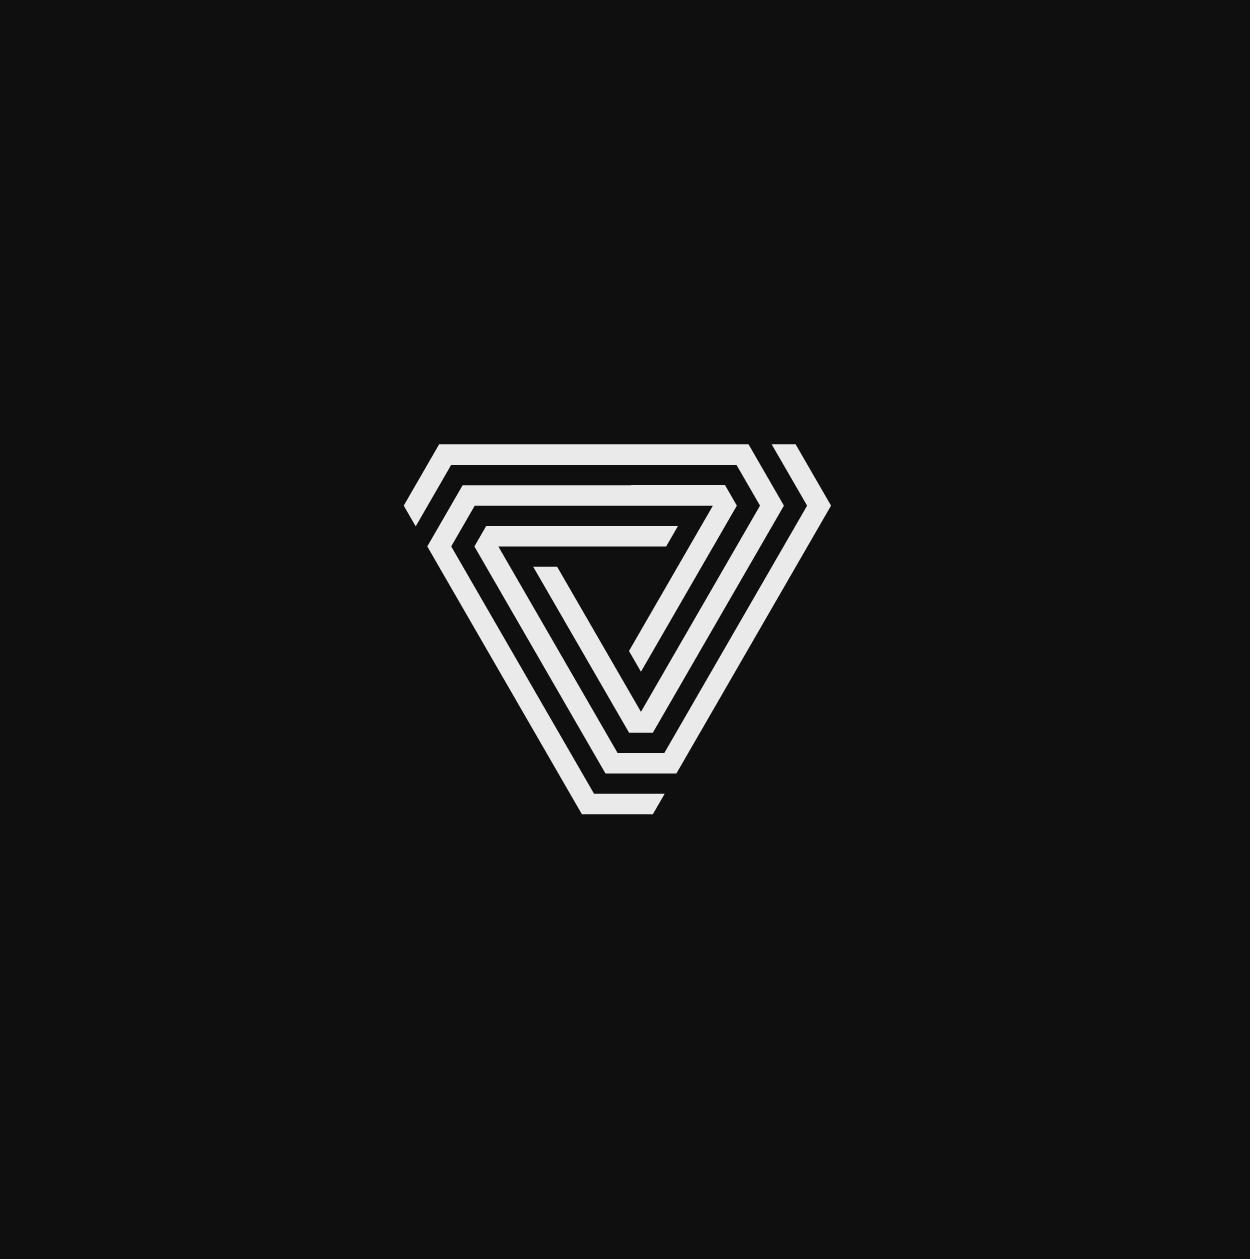 Sylvan_Logofolio2019_Artboard 129 copy1250.jpg